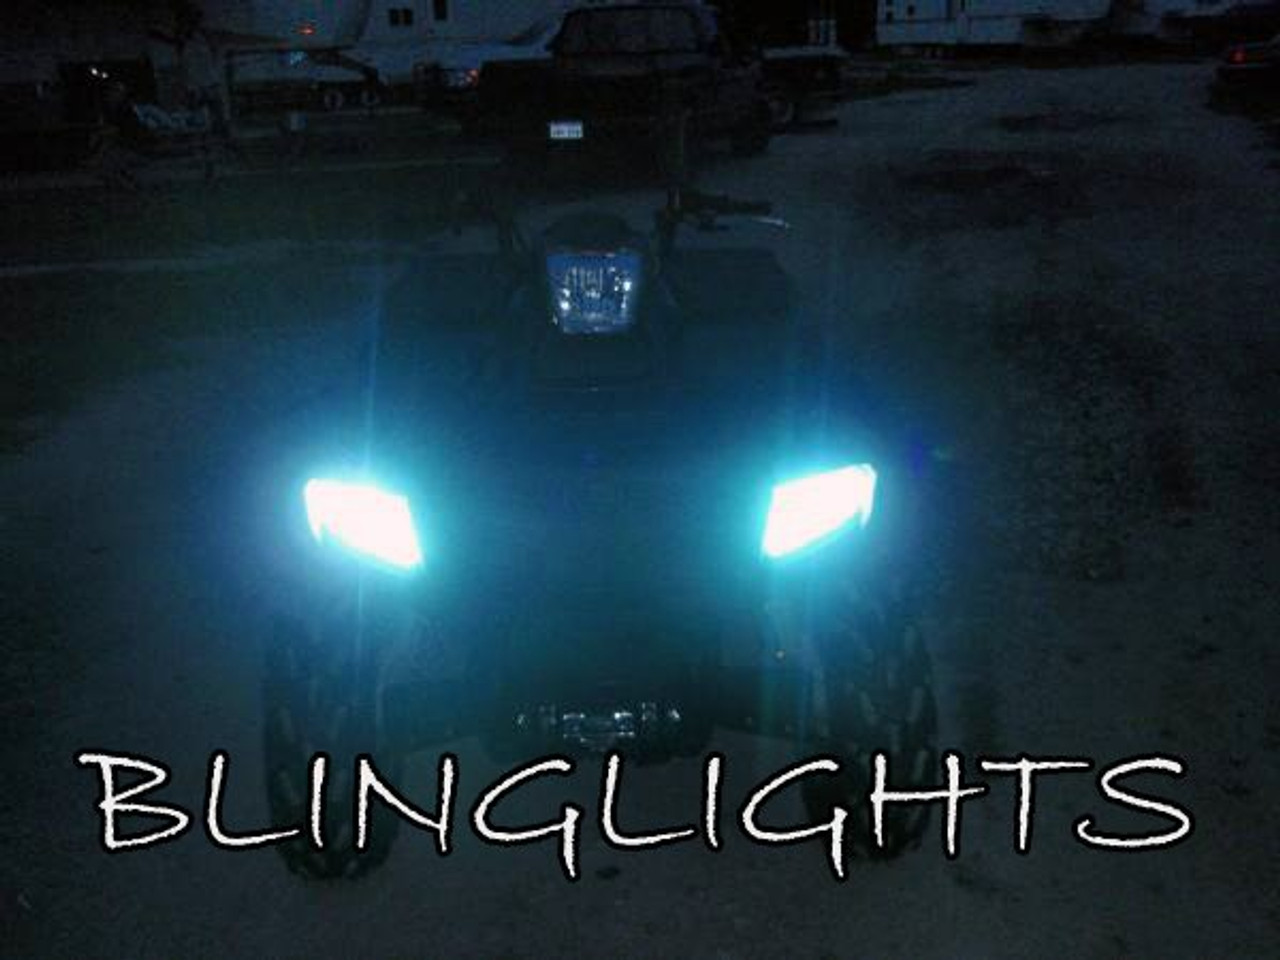 Polaris Sportsman Xenon HID 2 Light Conversion Kit for Headlamps Headlights Head Lamps HIDs Lights